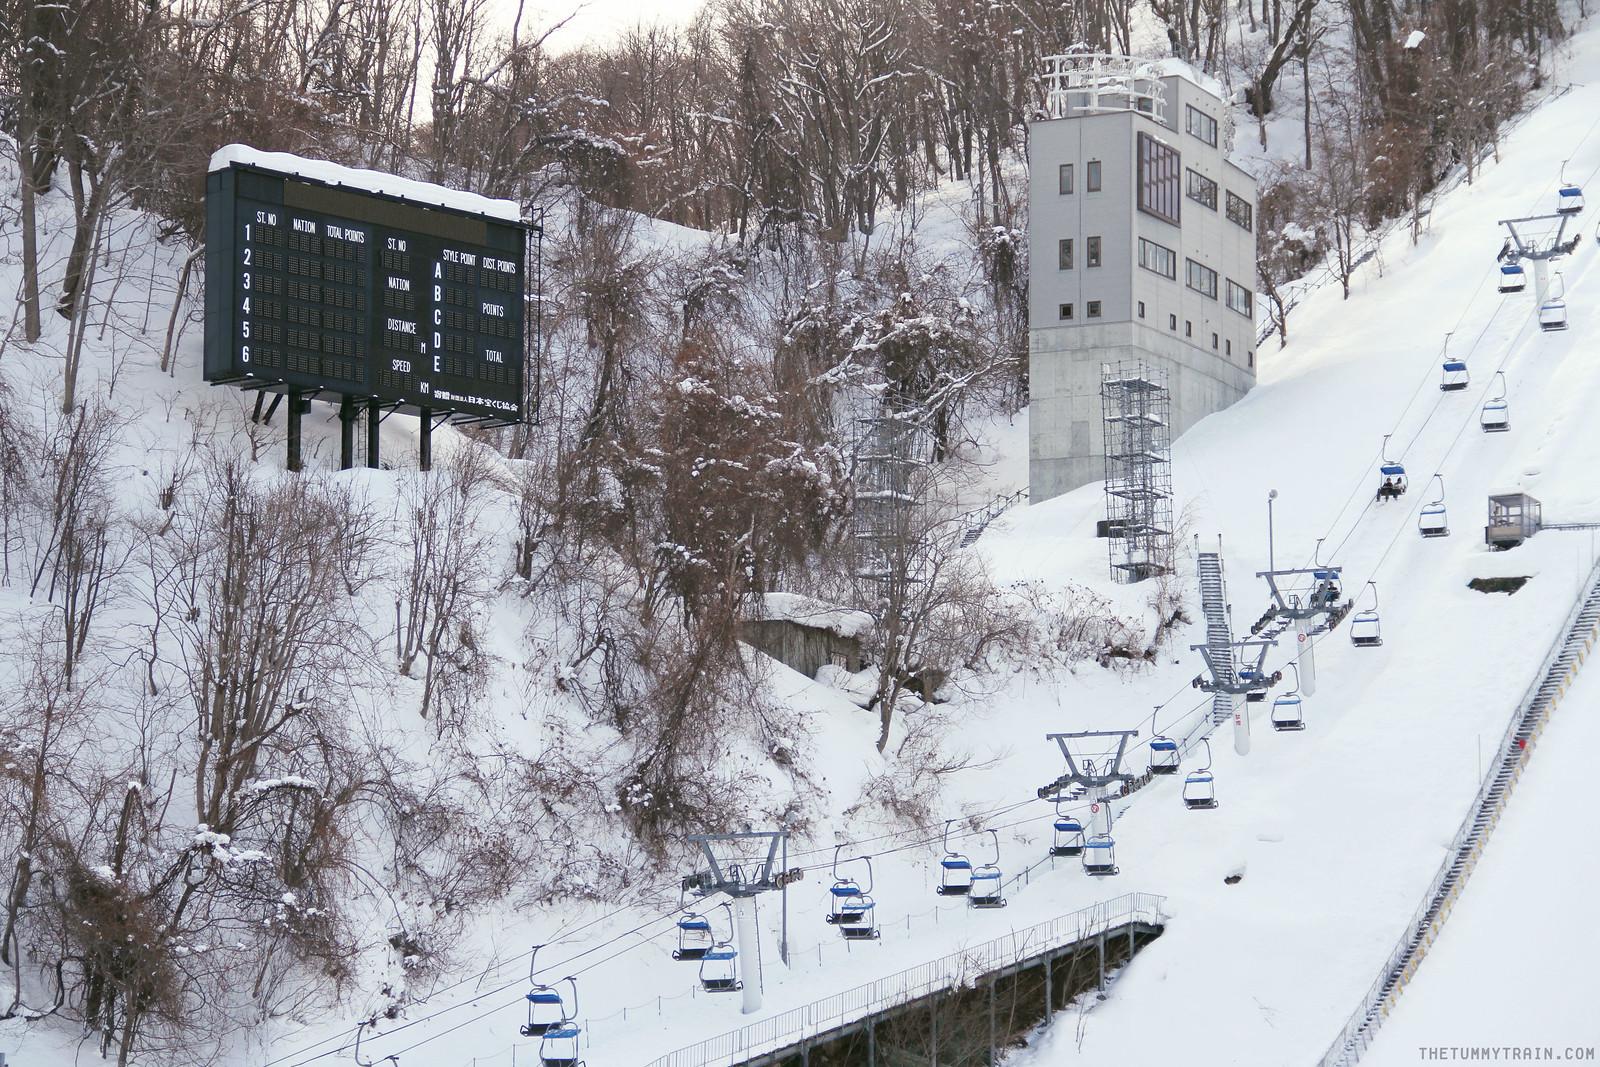 32101910373 e39adc8ab4 h - Sapporo Snow And Smile: 8 Unforgettable Winter Experiences in Sapporo City